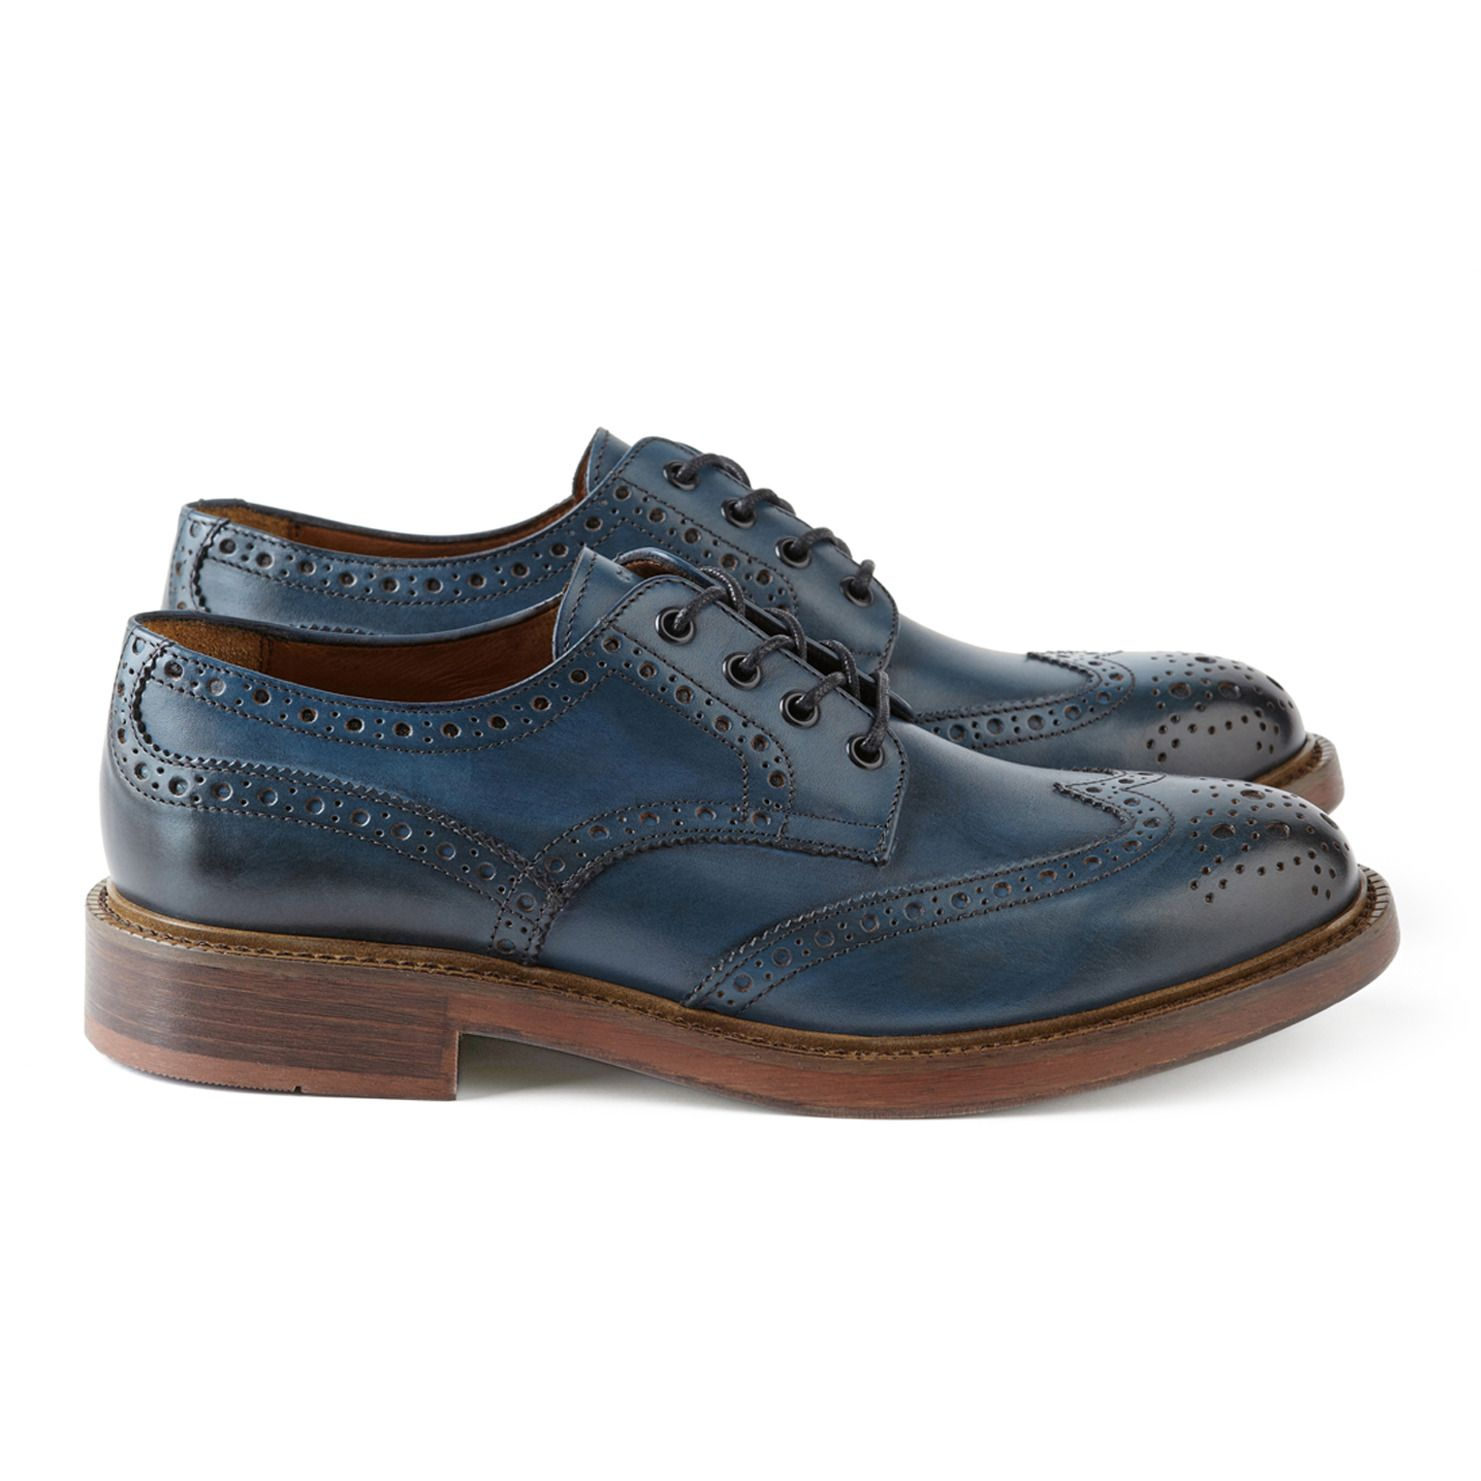 Mr Bs Tommi Round Toe Leather Oxford  N9N5XJW32